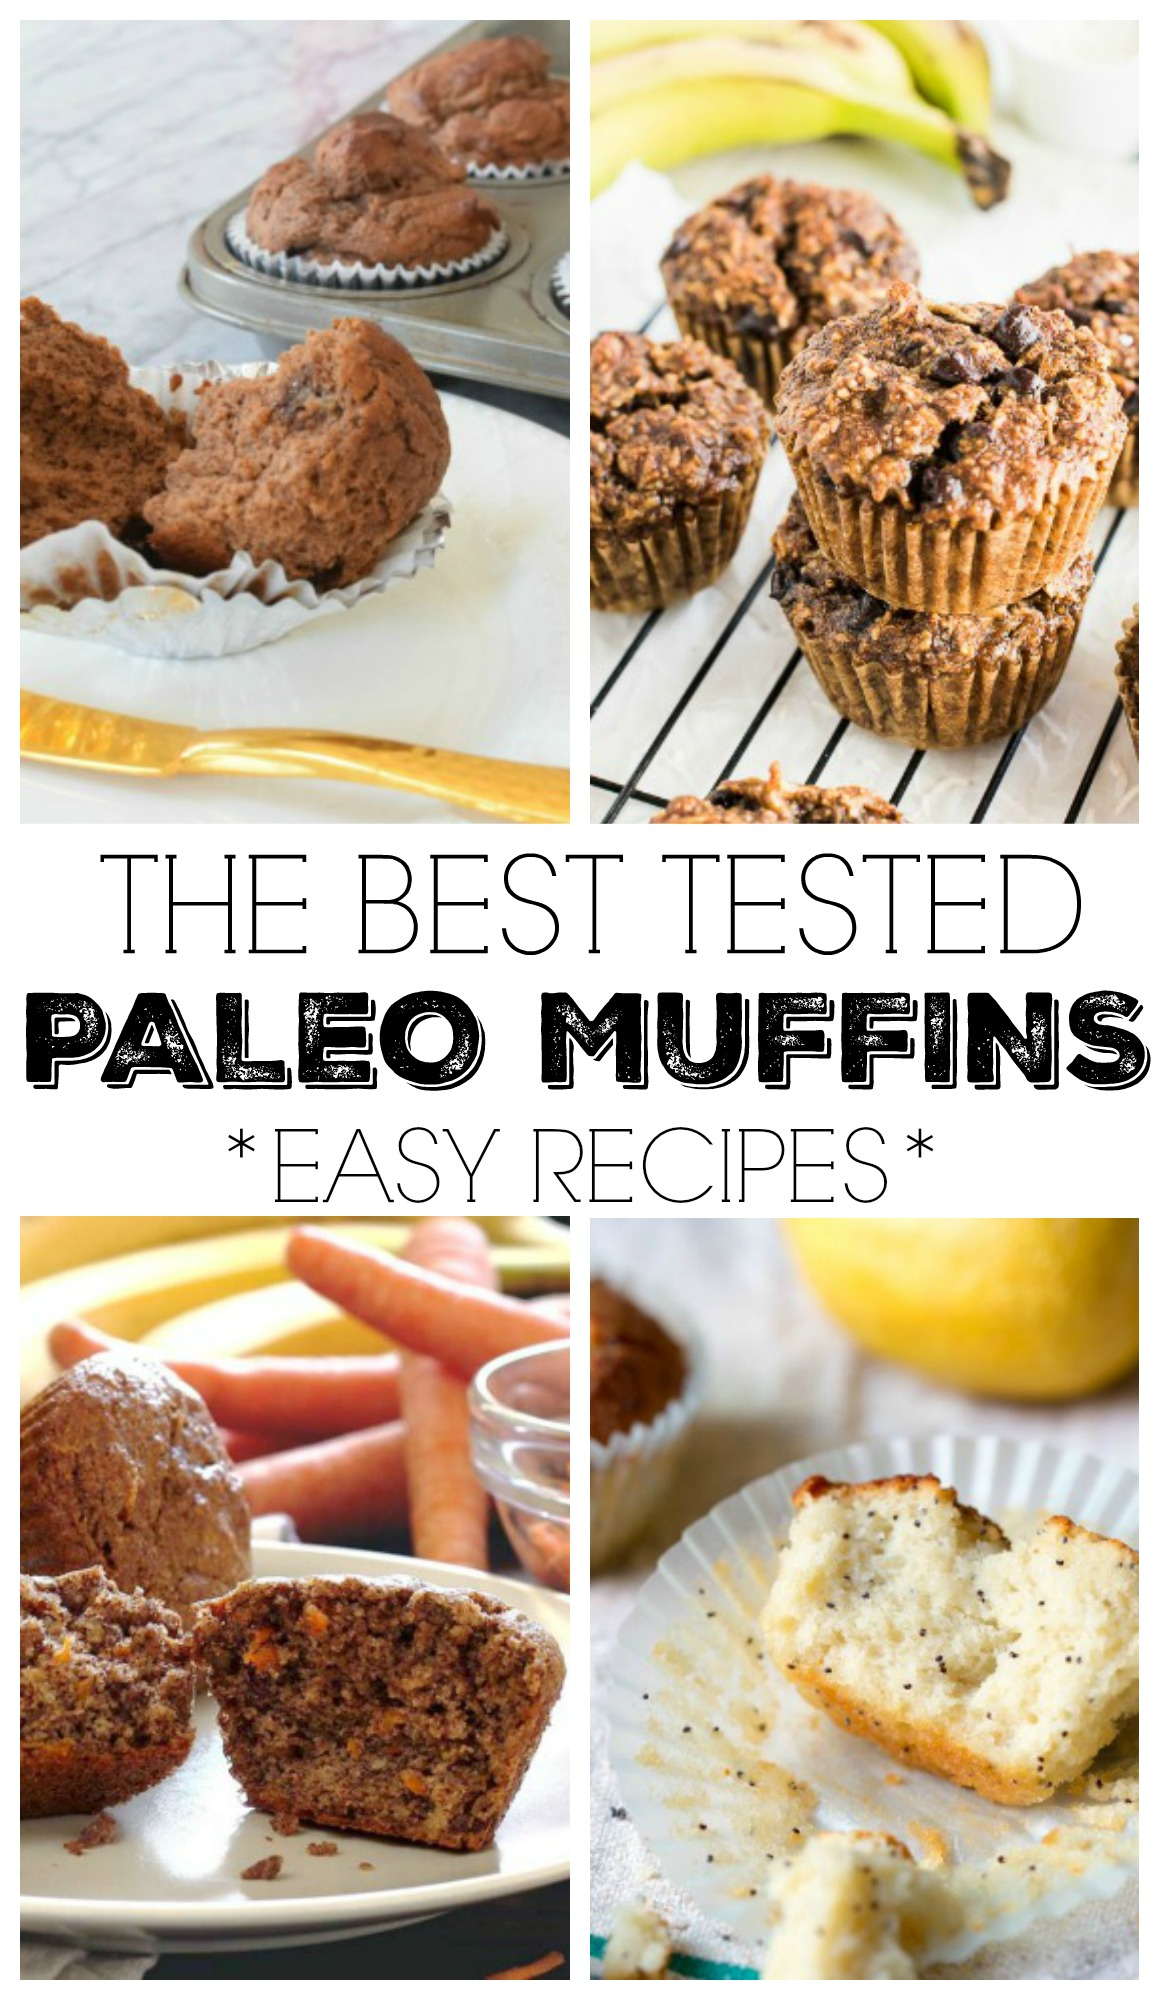 Paleo Muffins- Tried & Tested Top Paleo Muffin Recipes